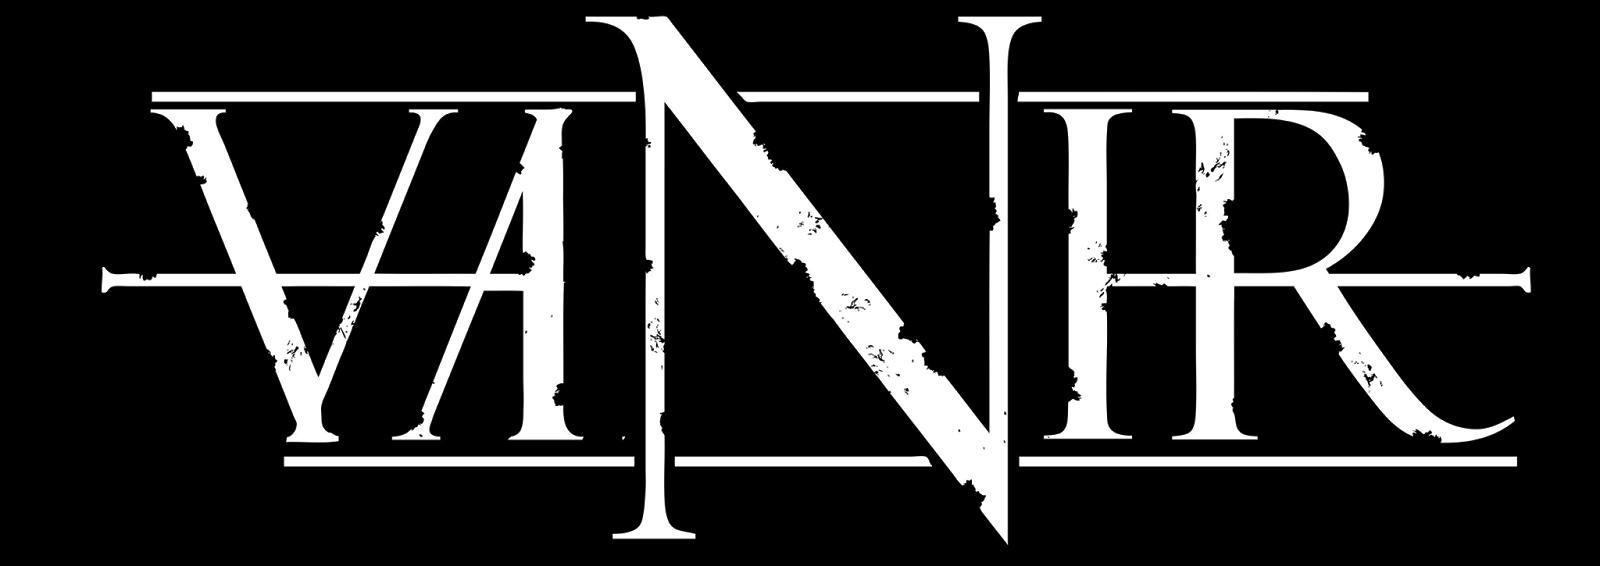 Vanir - Logo